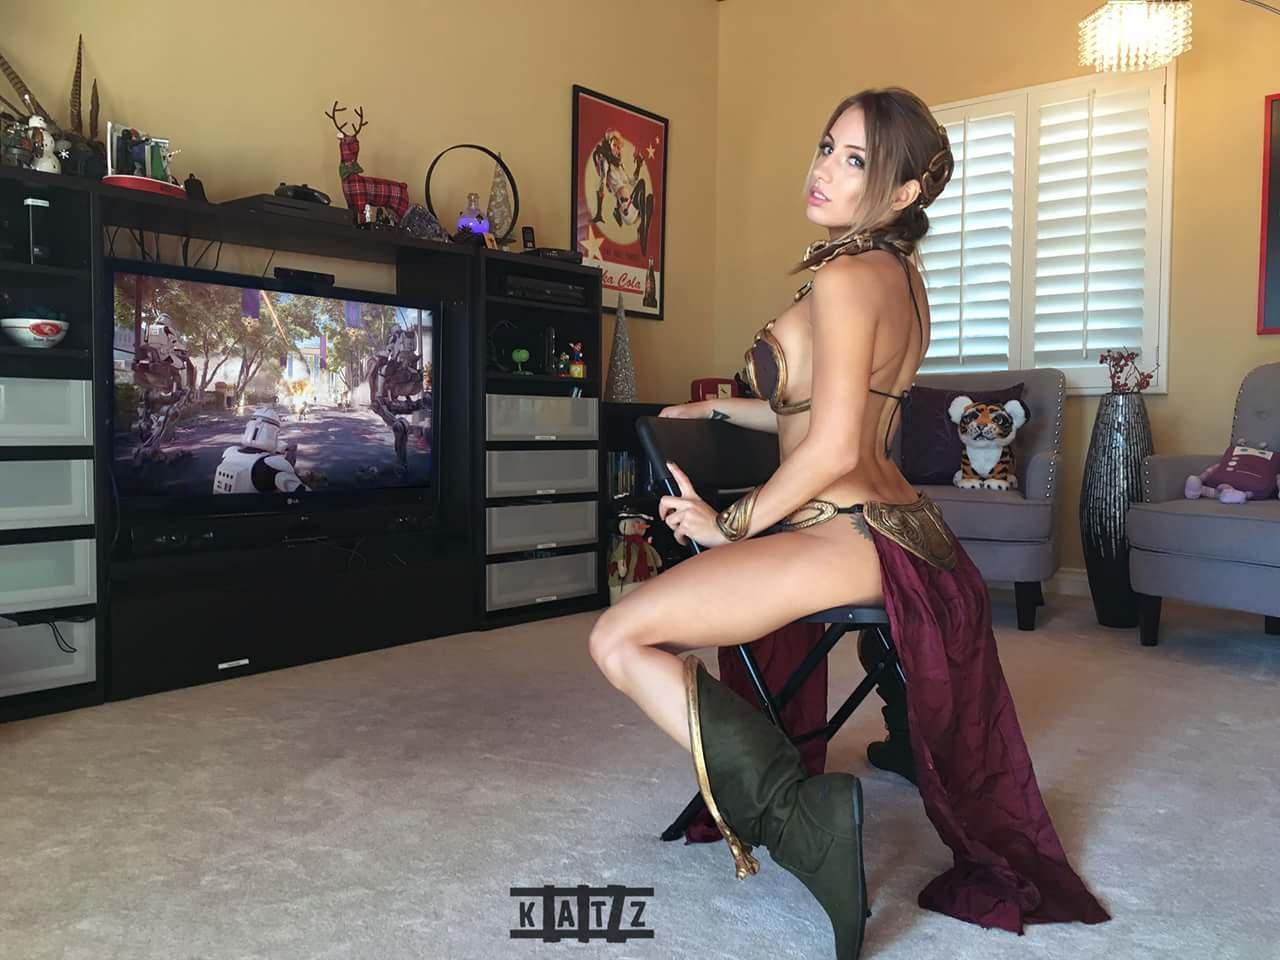 Liz Katz Slave Leia Nude Cosplay Onlyfans Leaked Photos 14